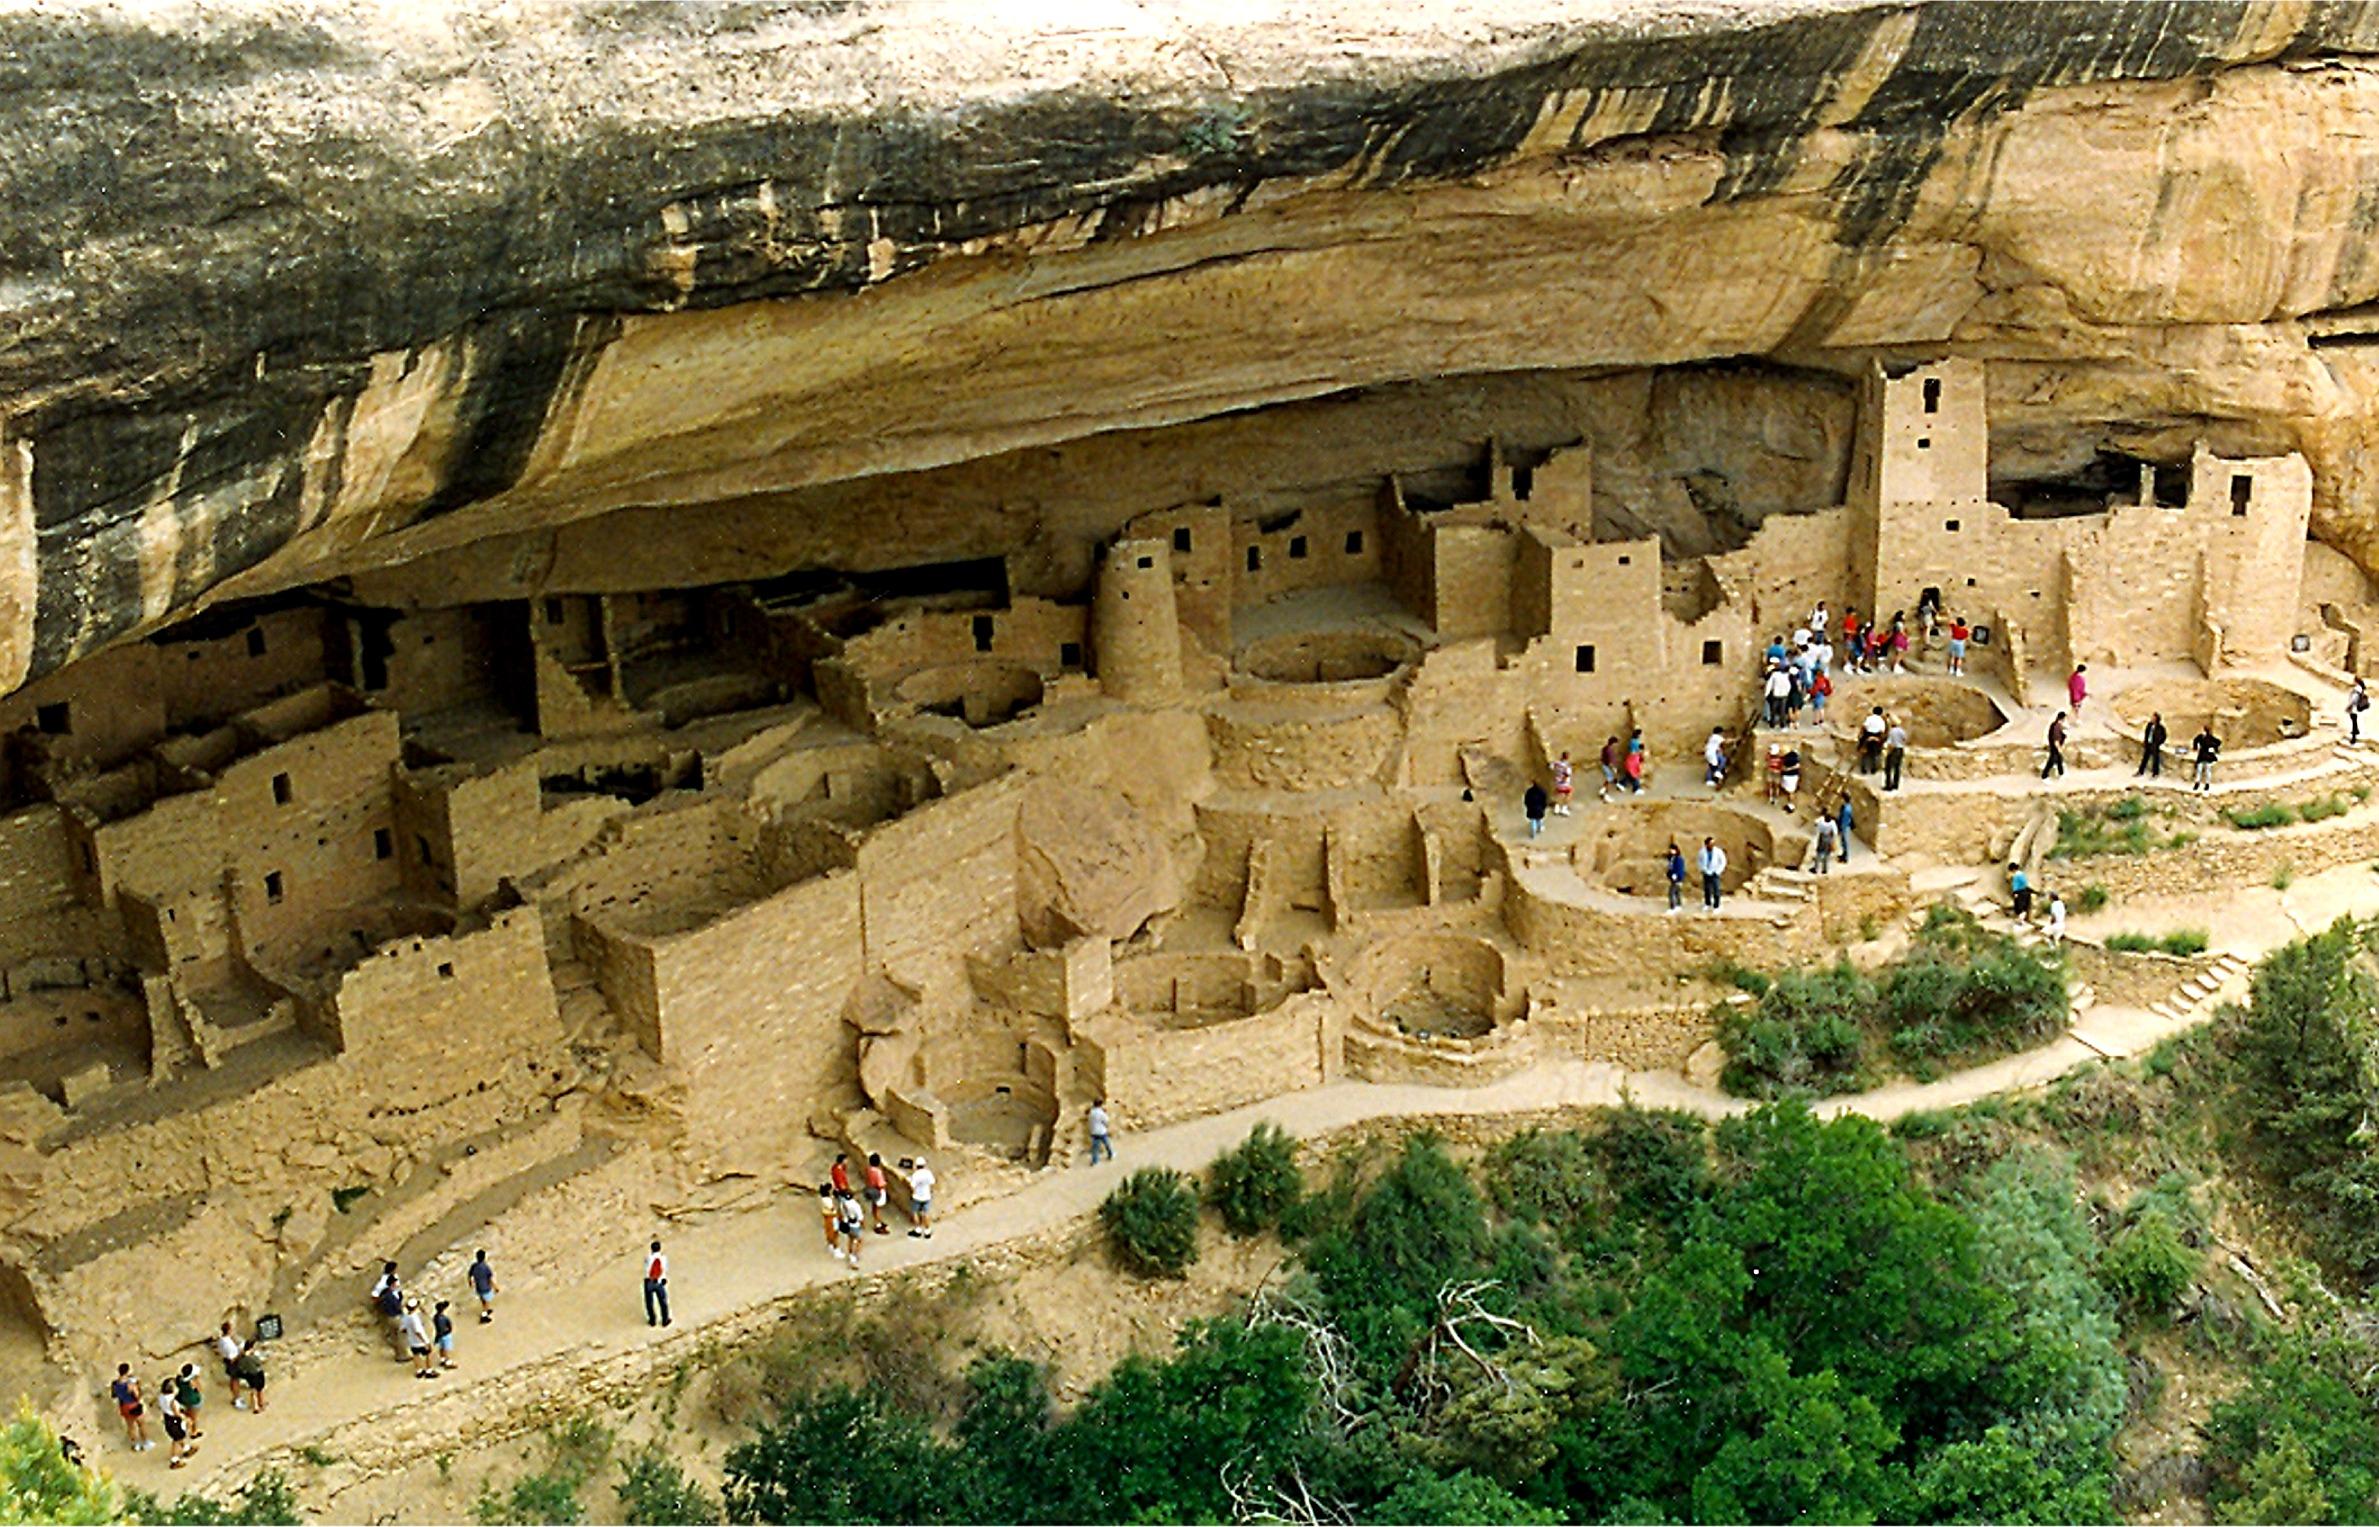 A study on the anasazi indians